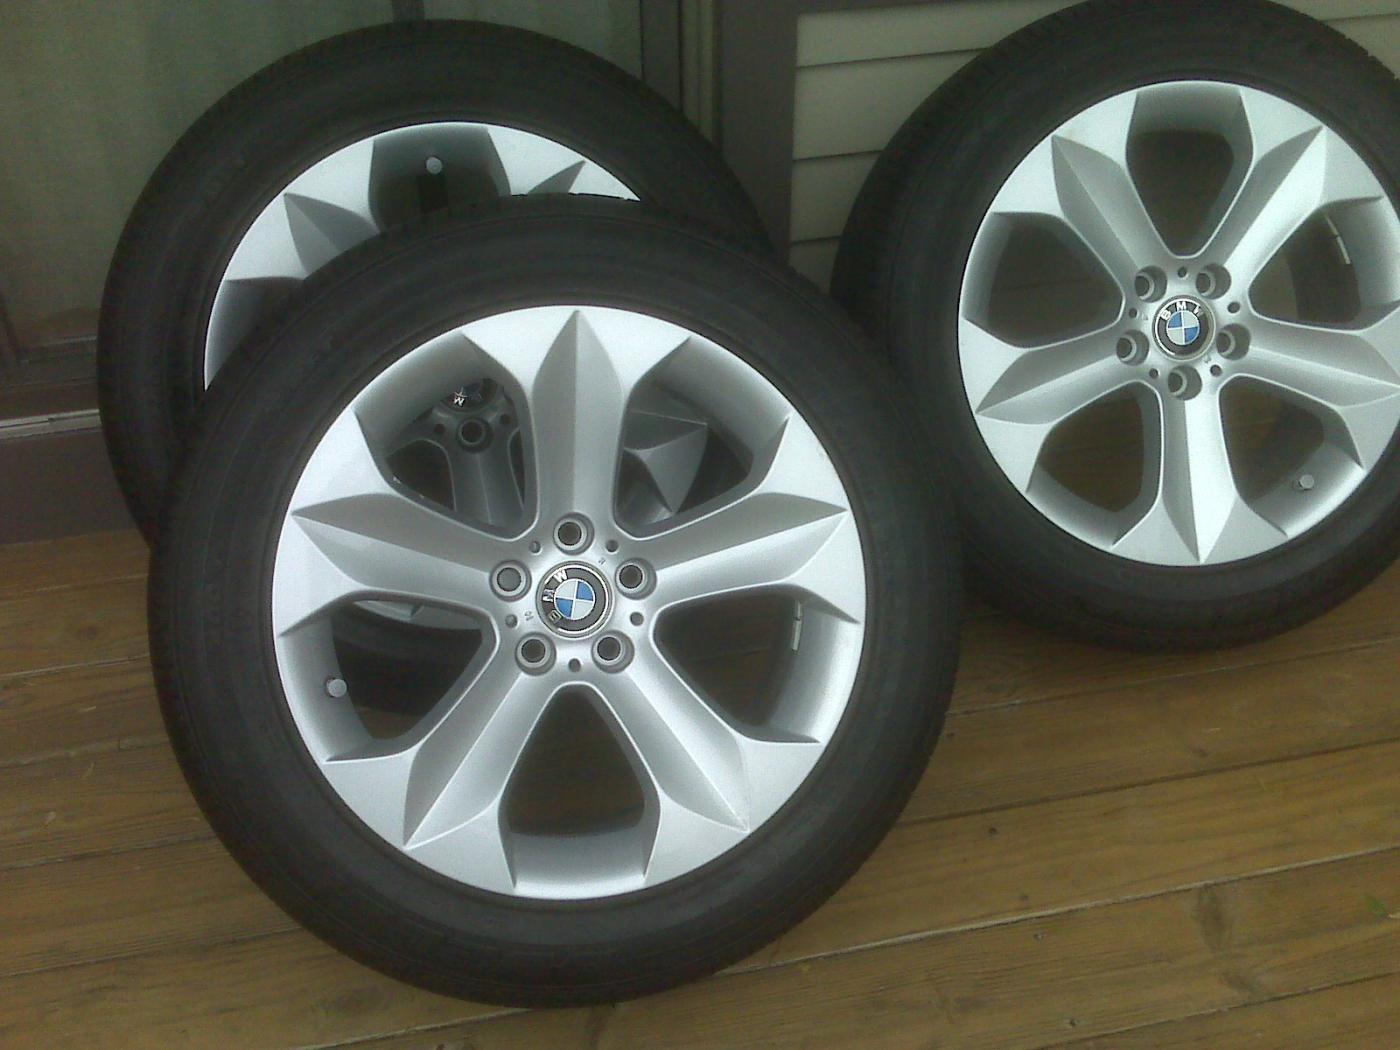 2010 Bmw X6 50i Wheels Amp Run Flat Tires Brand New Tires